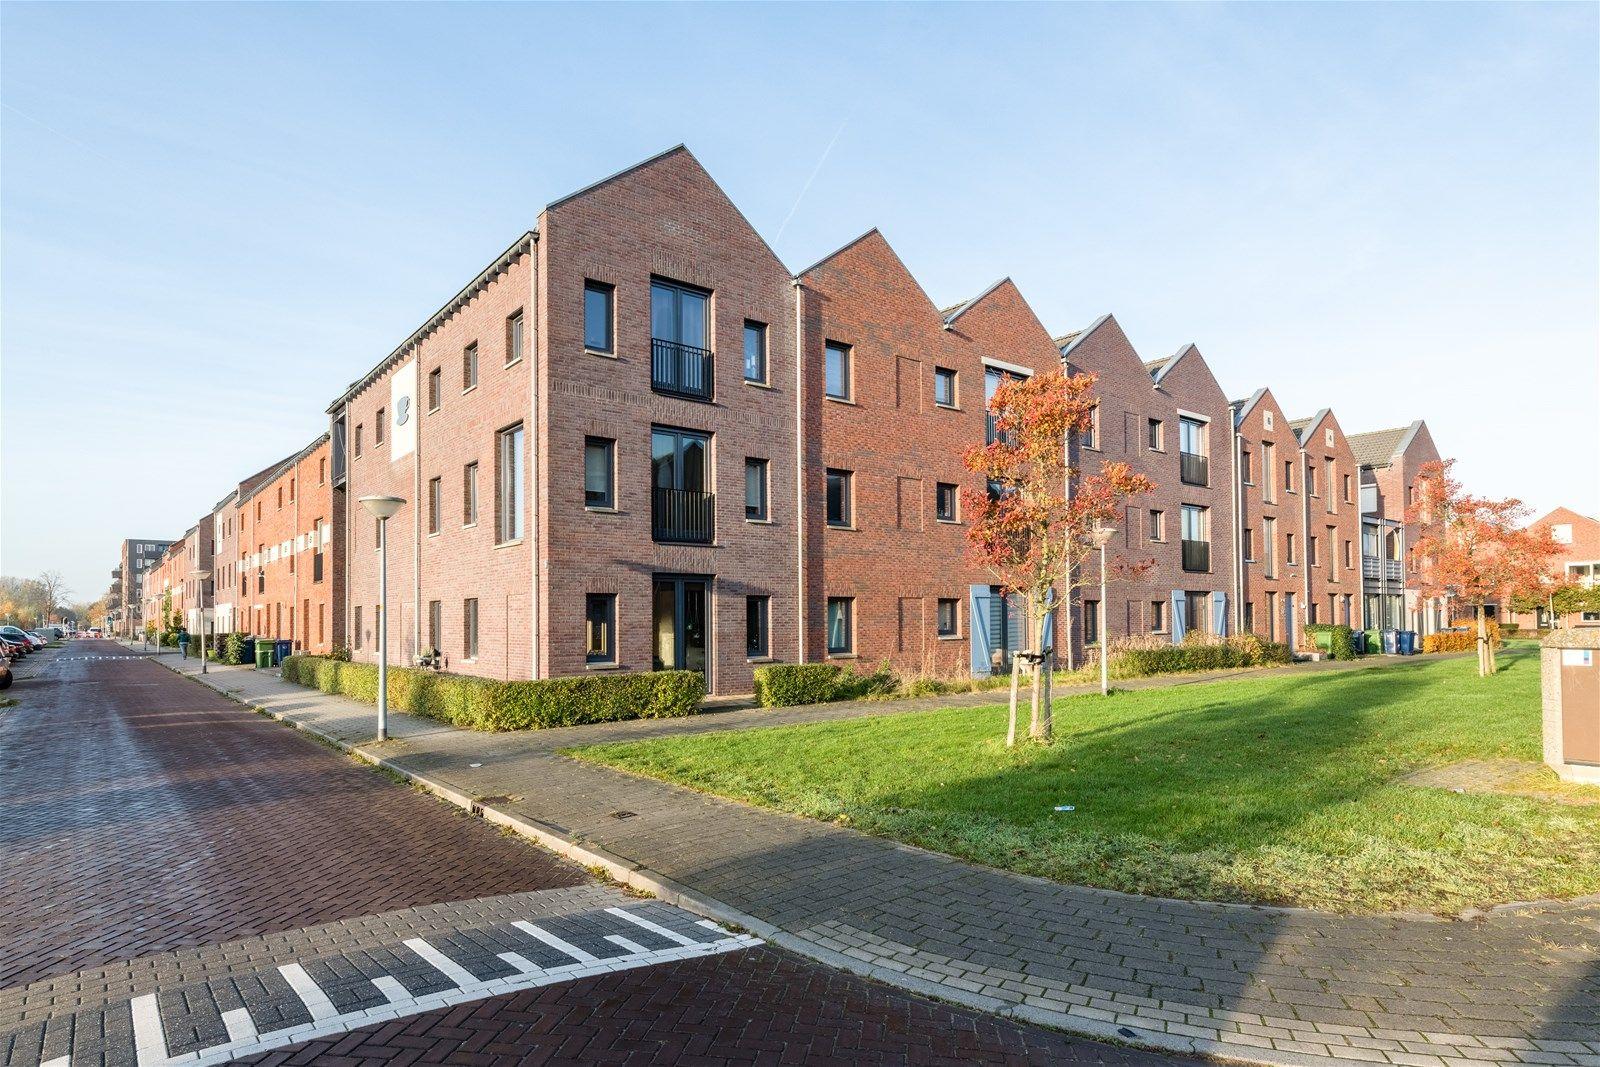 Dick Bosstraat 63, Almere